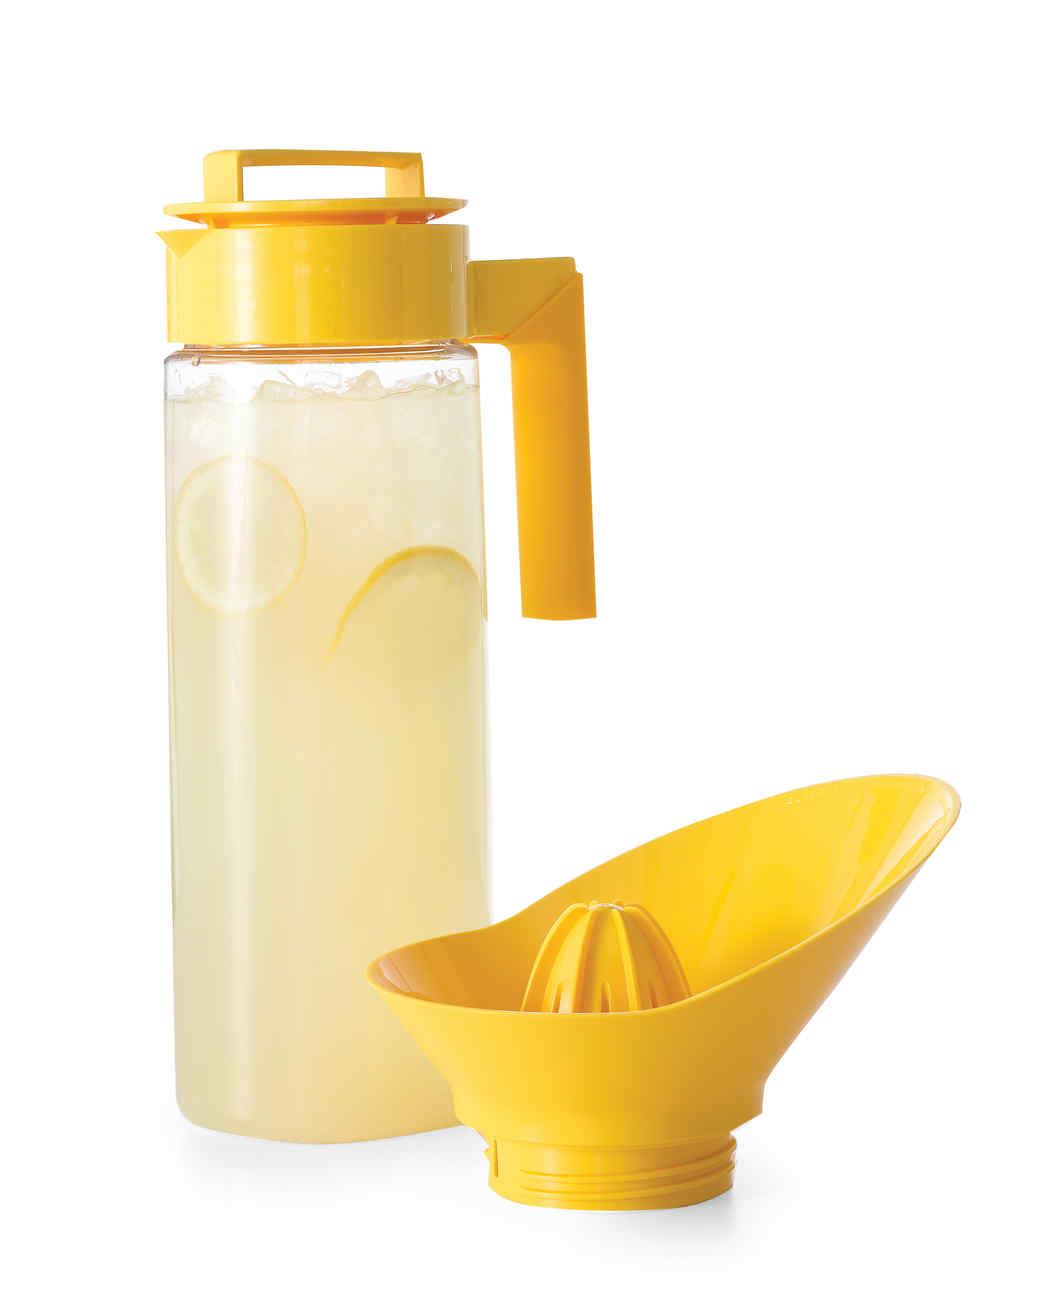 lemonade-finds-0811mld107422.jpg